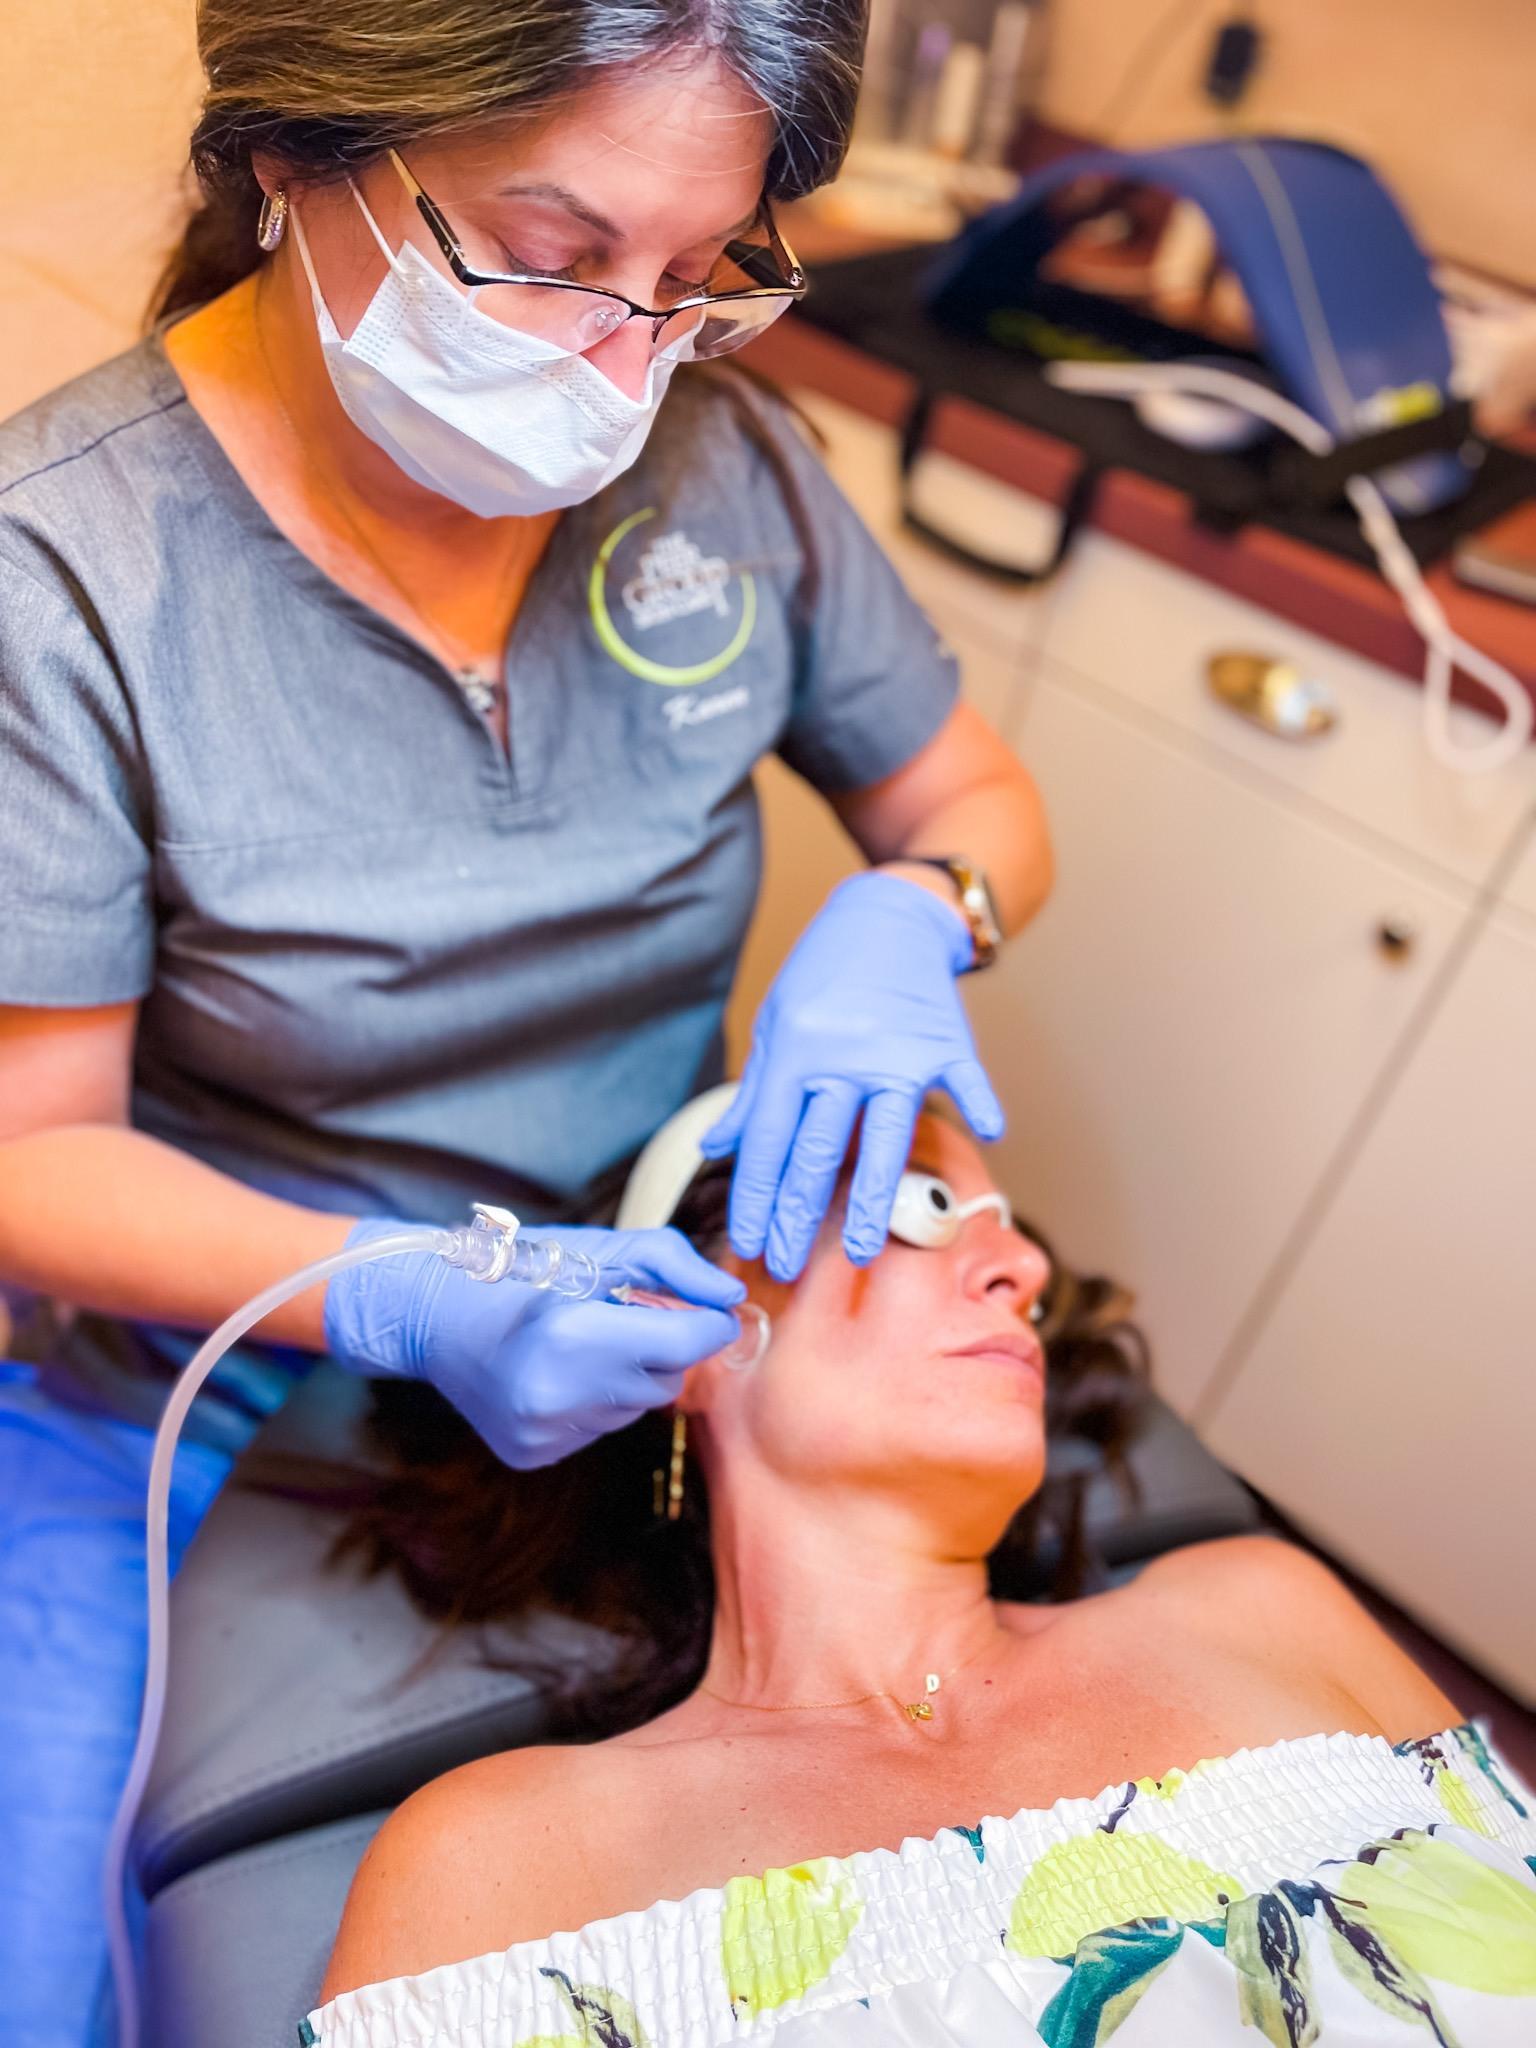 Hydrafacial: The Perfect Summer Skincare Treatment